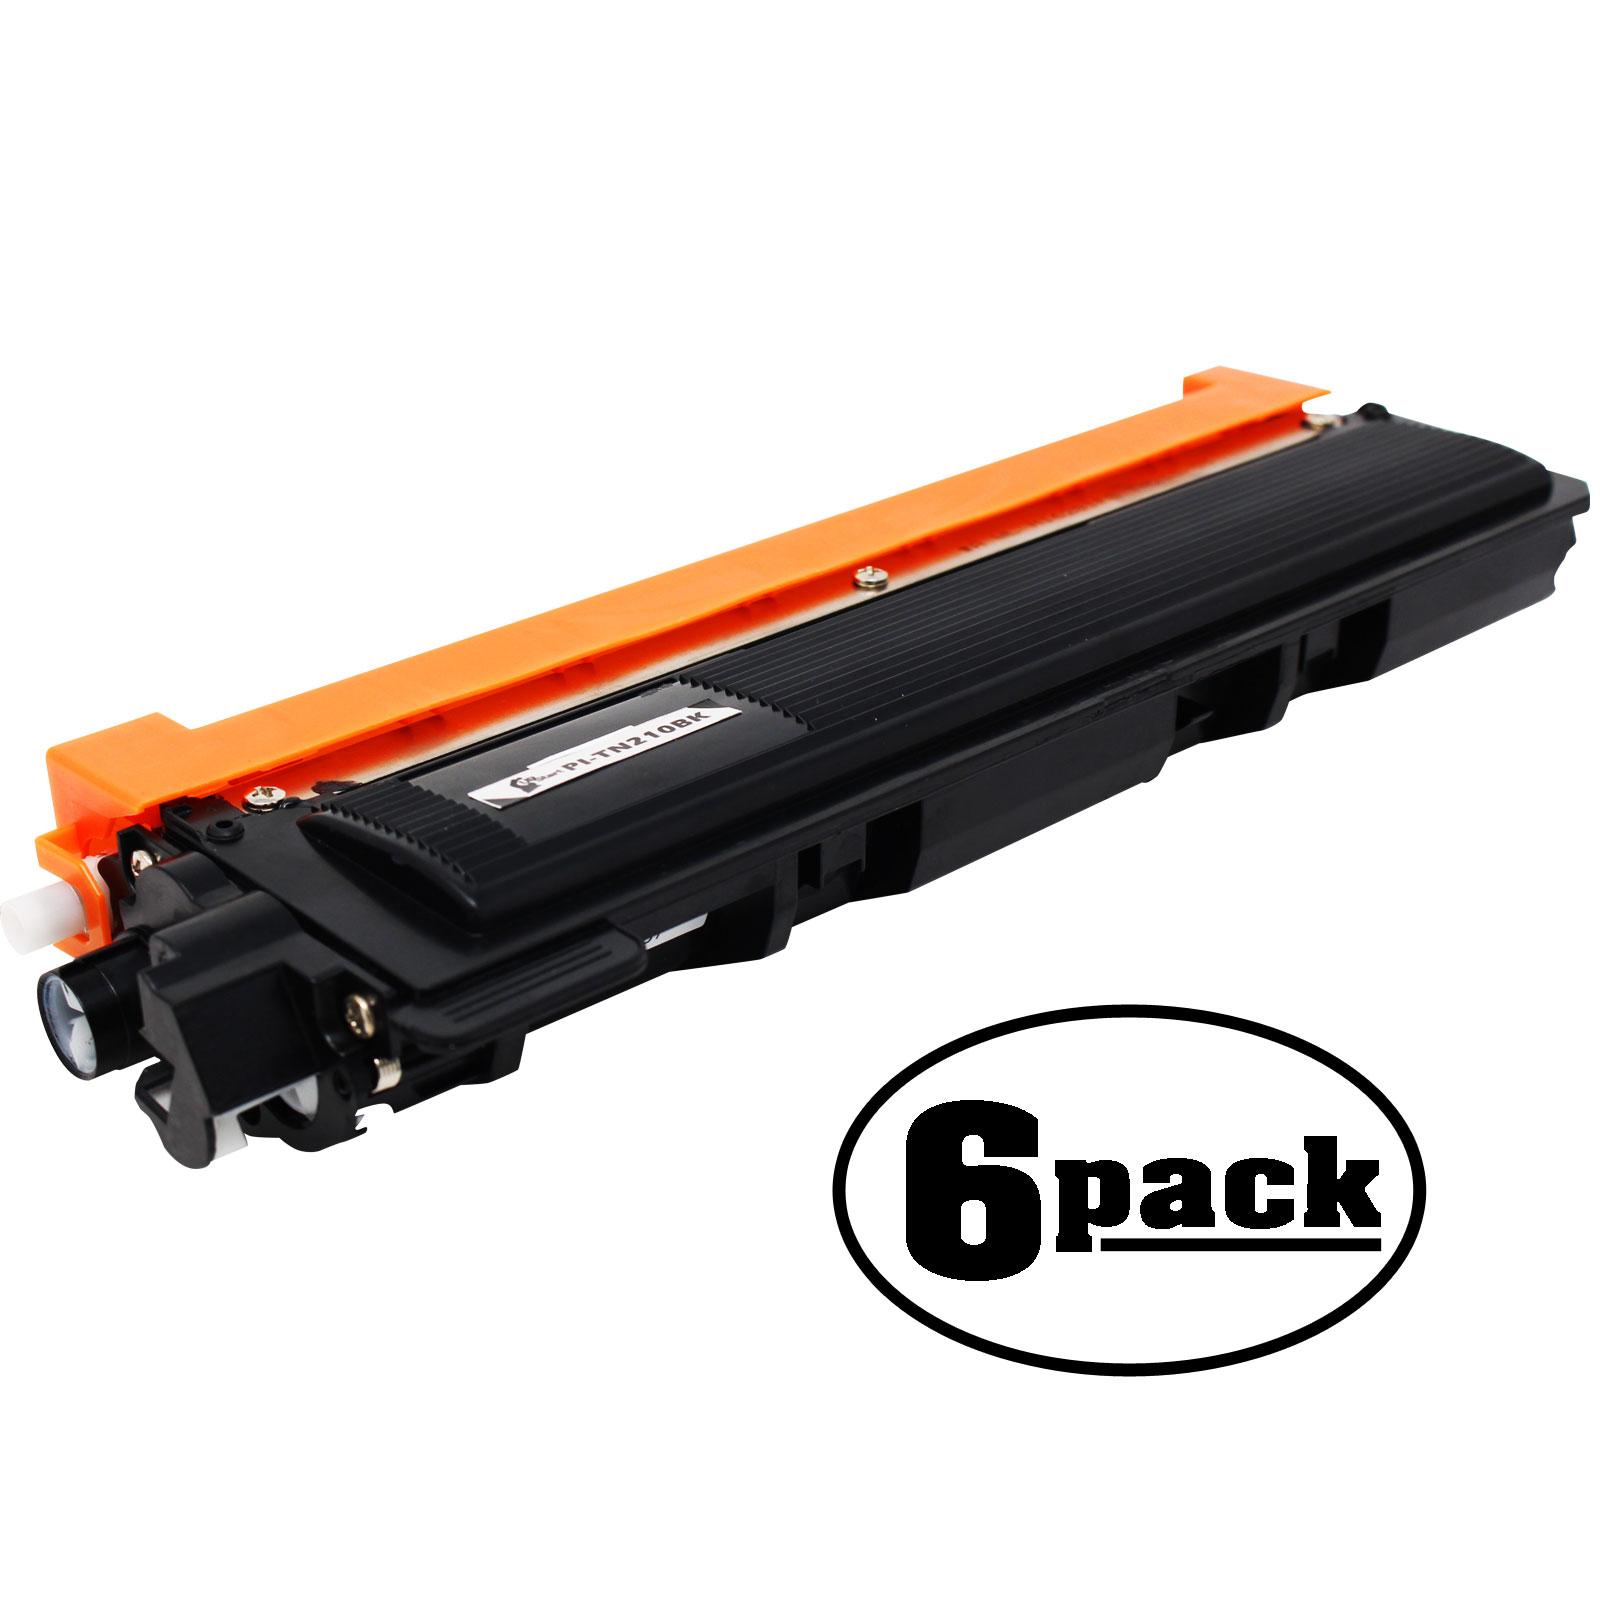 3 Pack BLACK Toner For Brother TN210Bk Brother MFC-9010CN MFC-9120CN MFC-9320CW